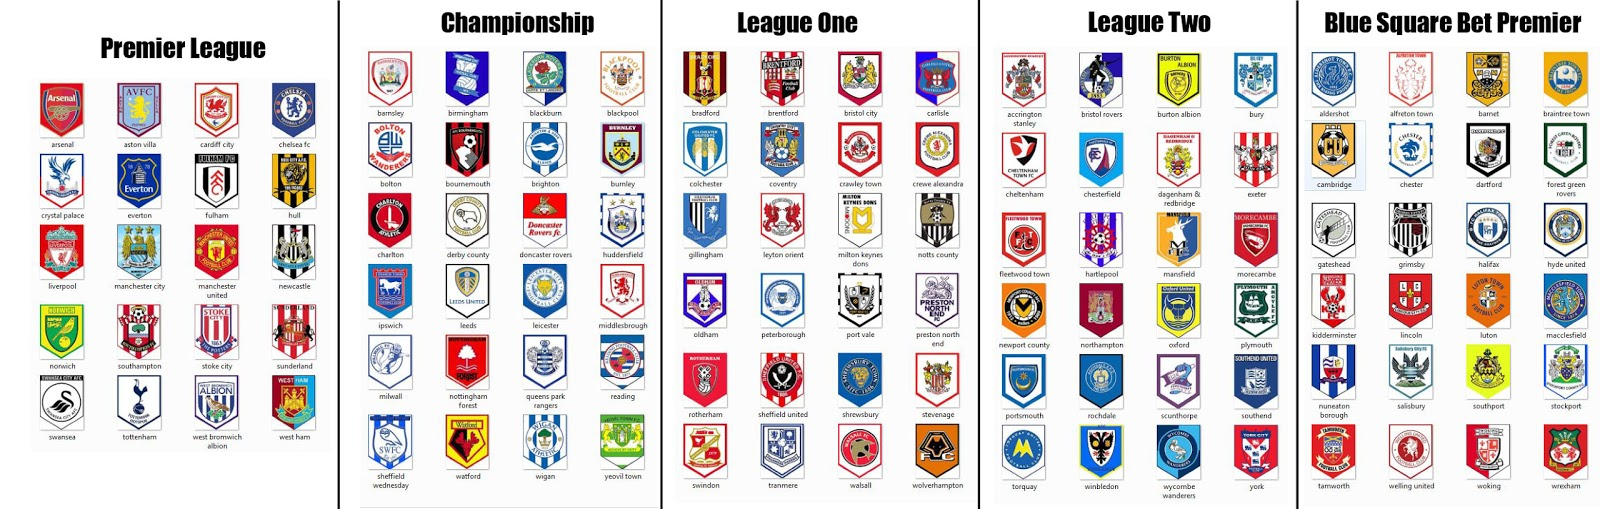 Fanions de football league 1 2 3 4 5 england 2013 2014 - Logo club foot espagnol ...